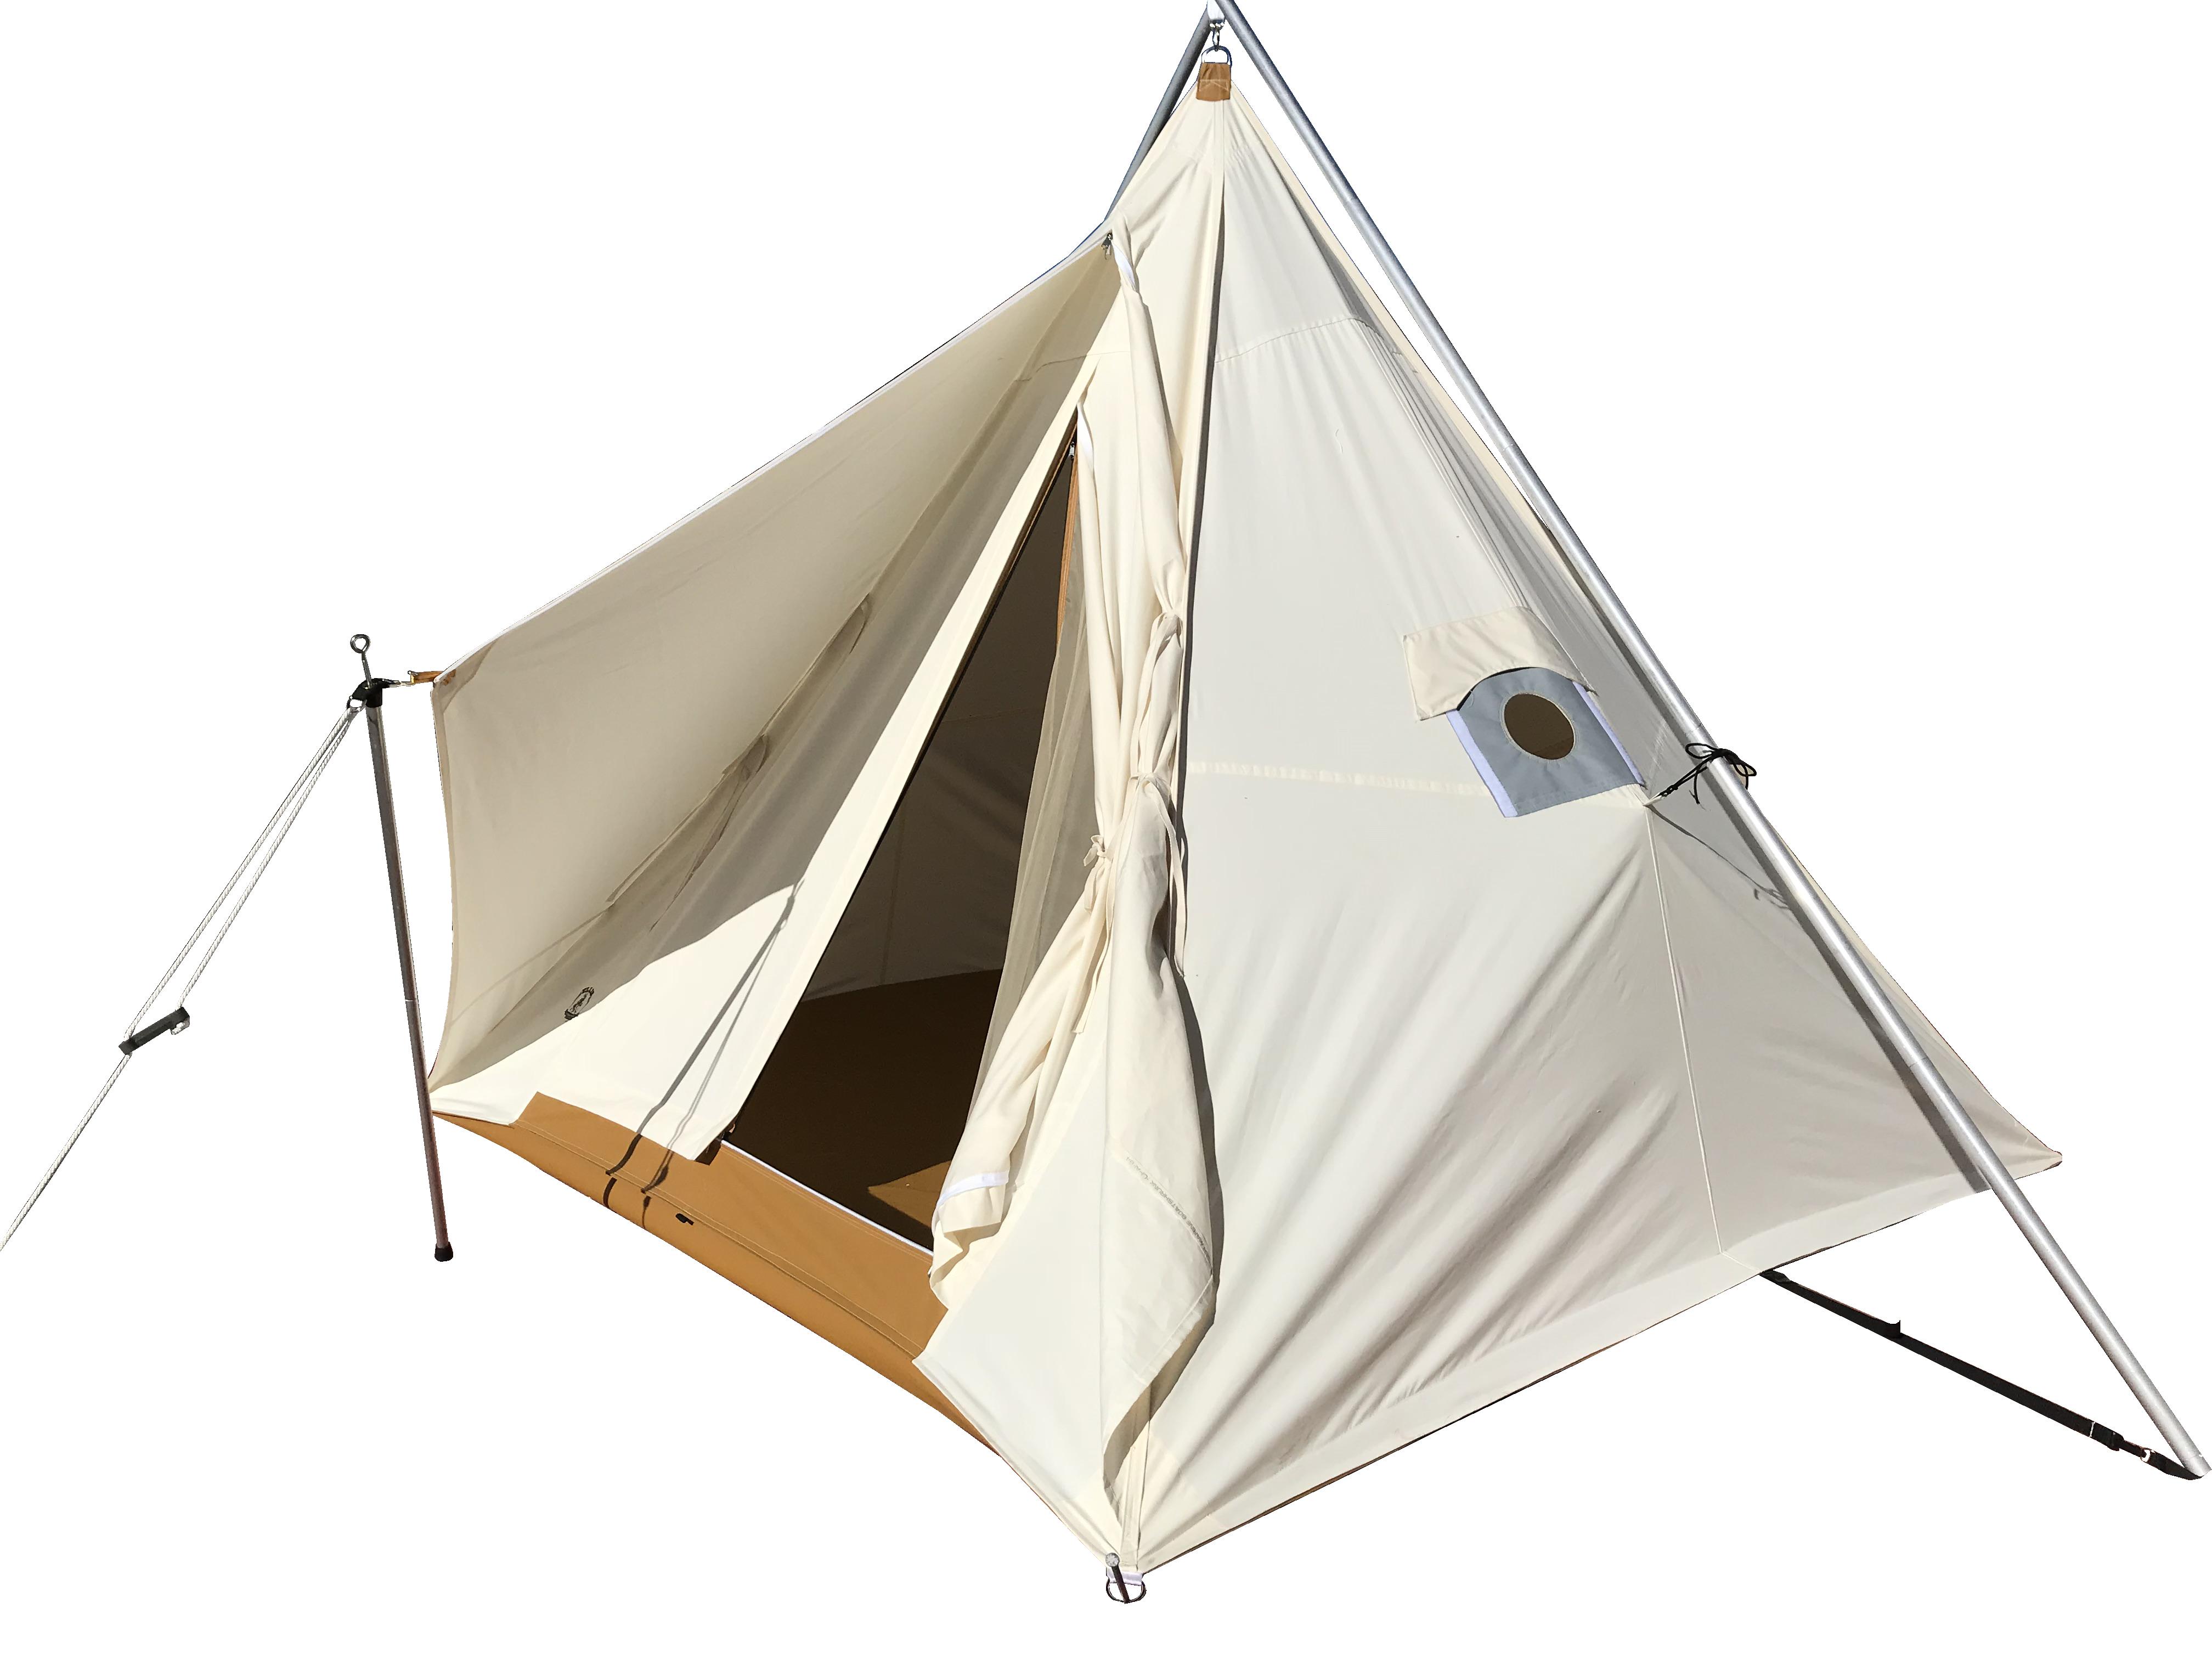 The range ellis canvas. Clipart tent pyramid tent